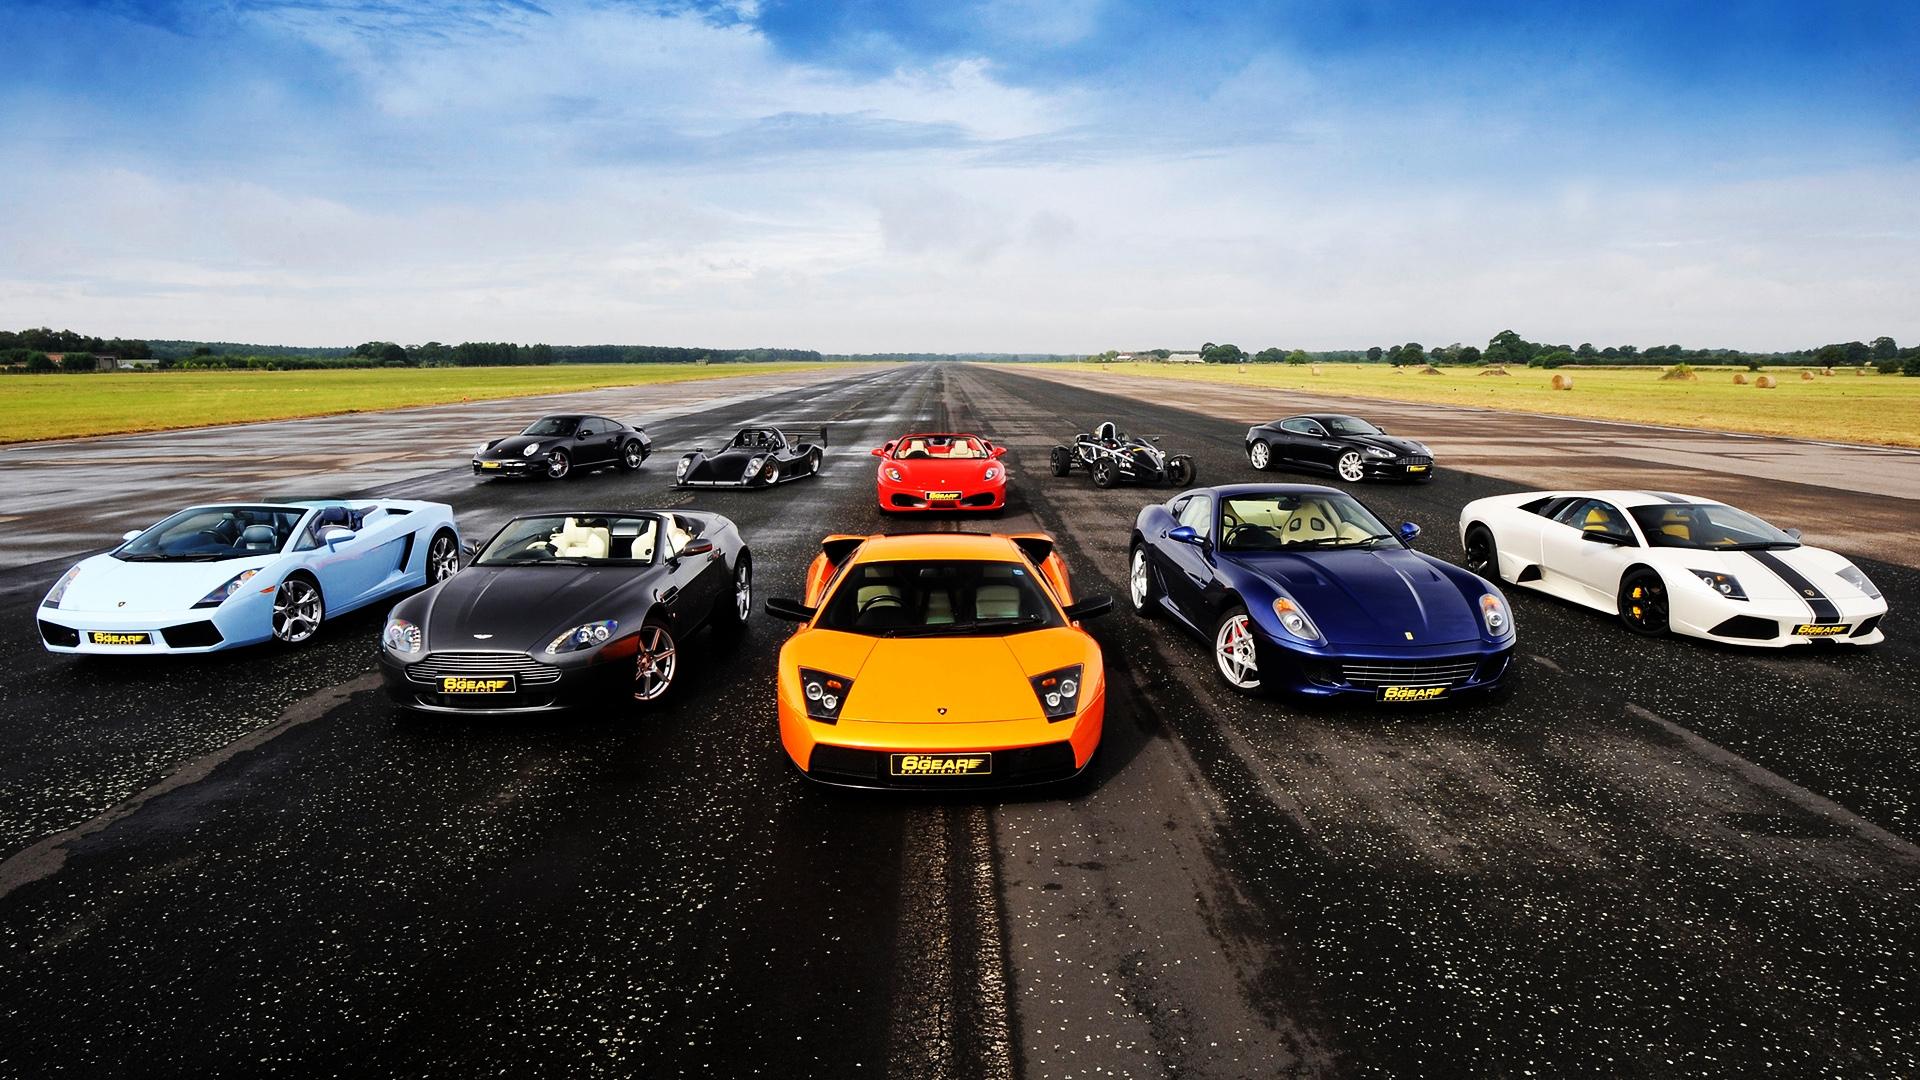 http://3.bp.blogspot.com/-cQyC8uF1MHQ/UHDcduISOqI/AAAAAAAALlU/iqPExlYR4qs/s0/supercars-1920x1080-wallpaper.jpg